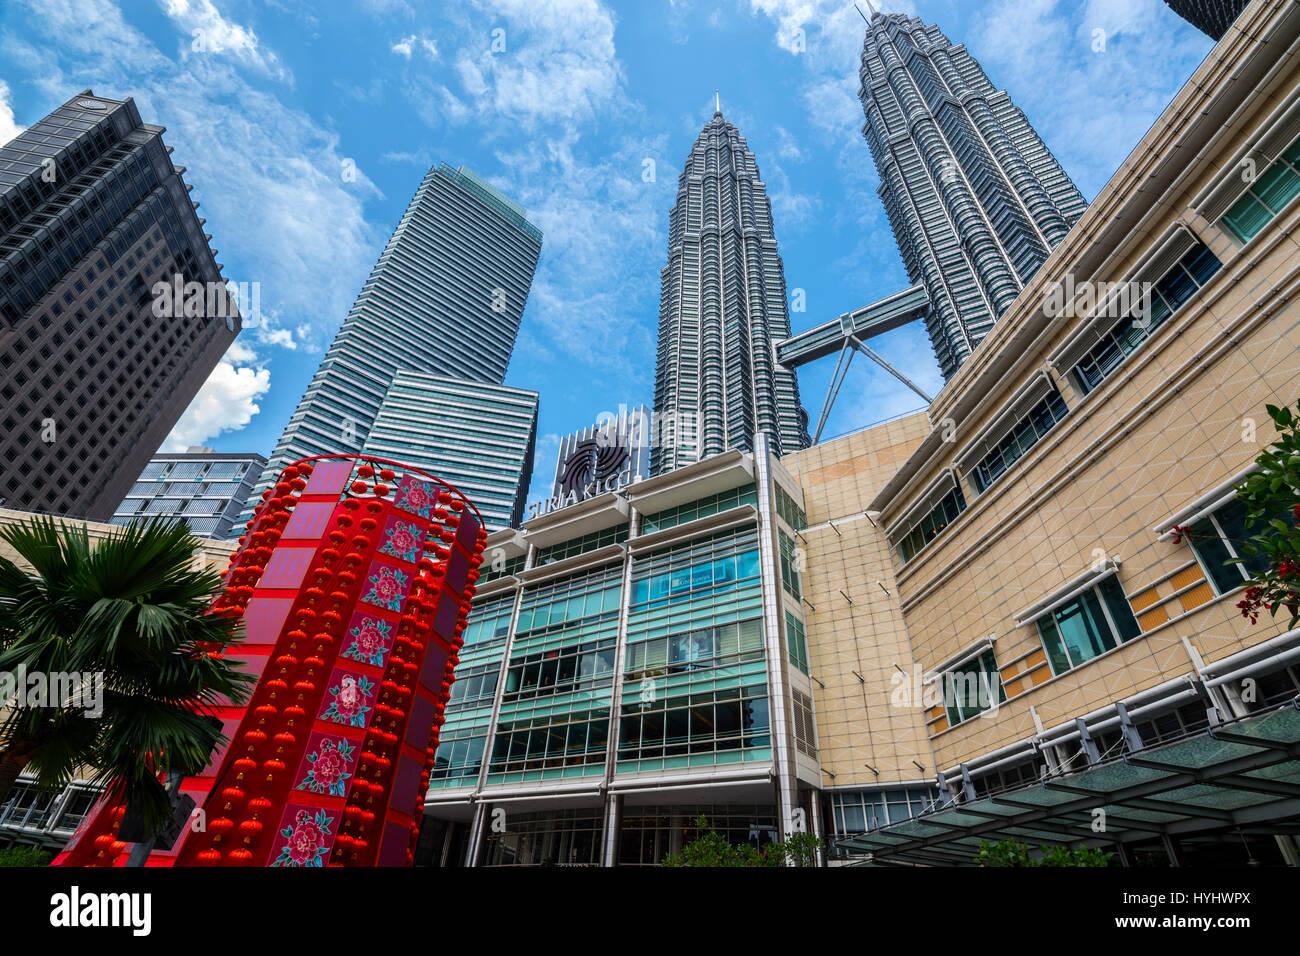 Petronas Twin Towers e Suria KLCC Shopping Mall, Kuala Lumpur, Malesia Immagini Stock